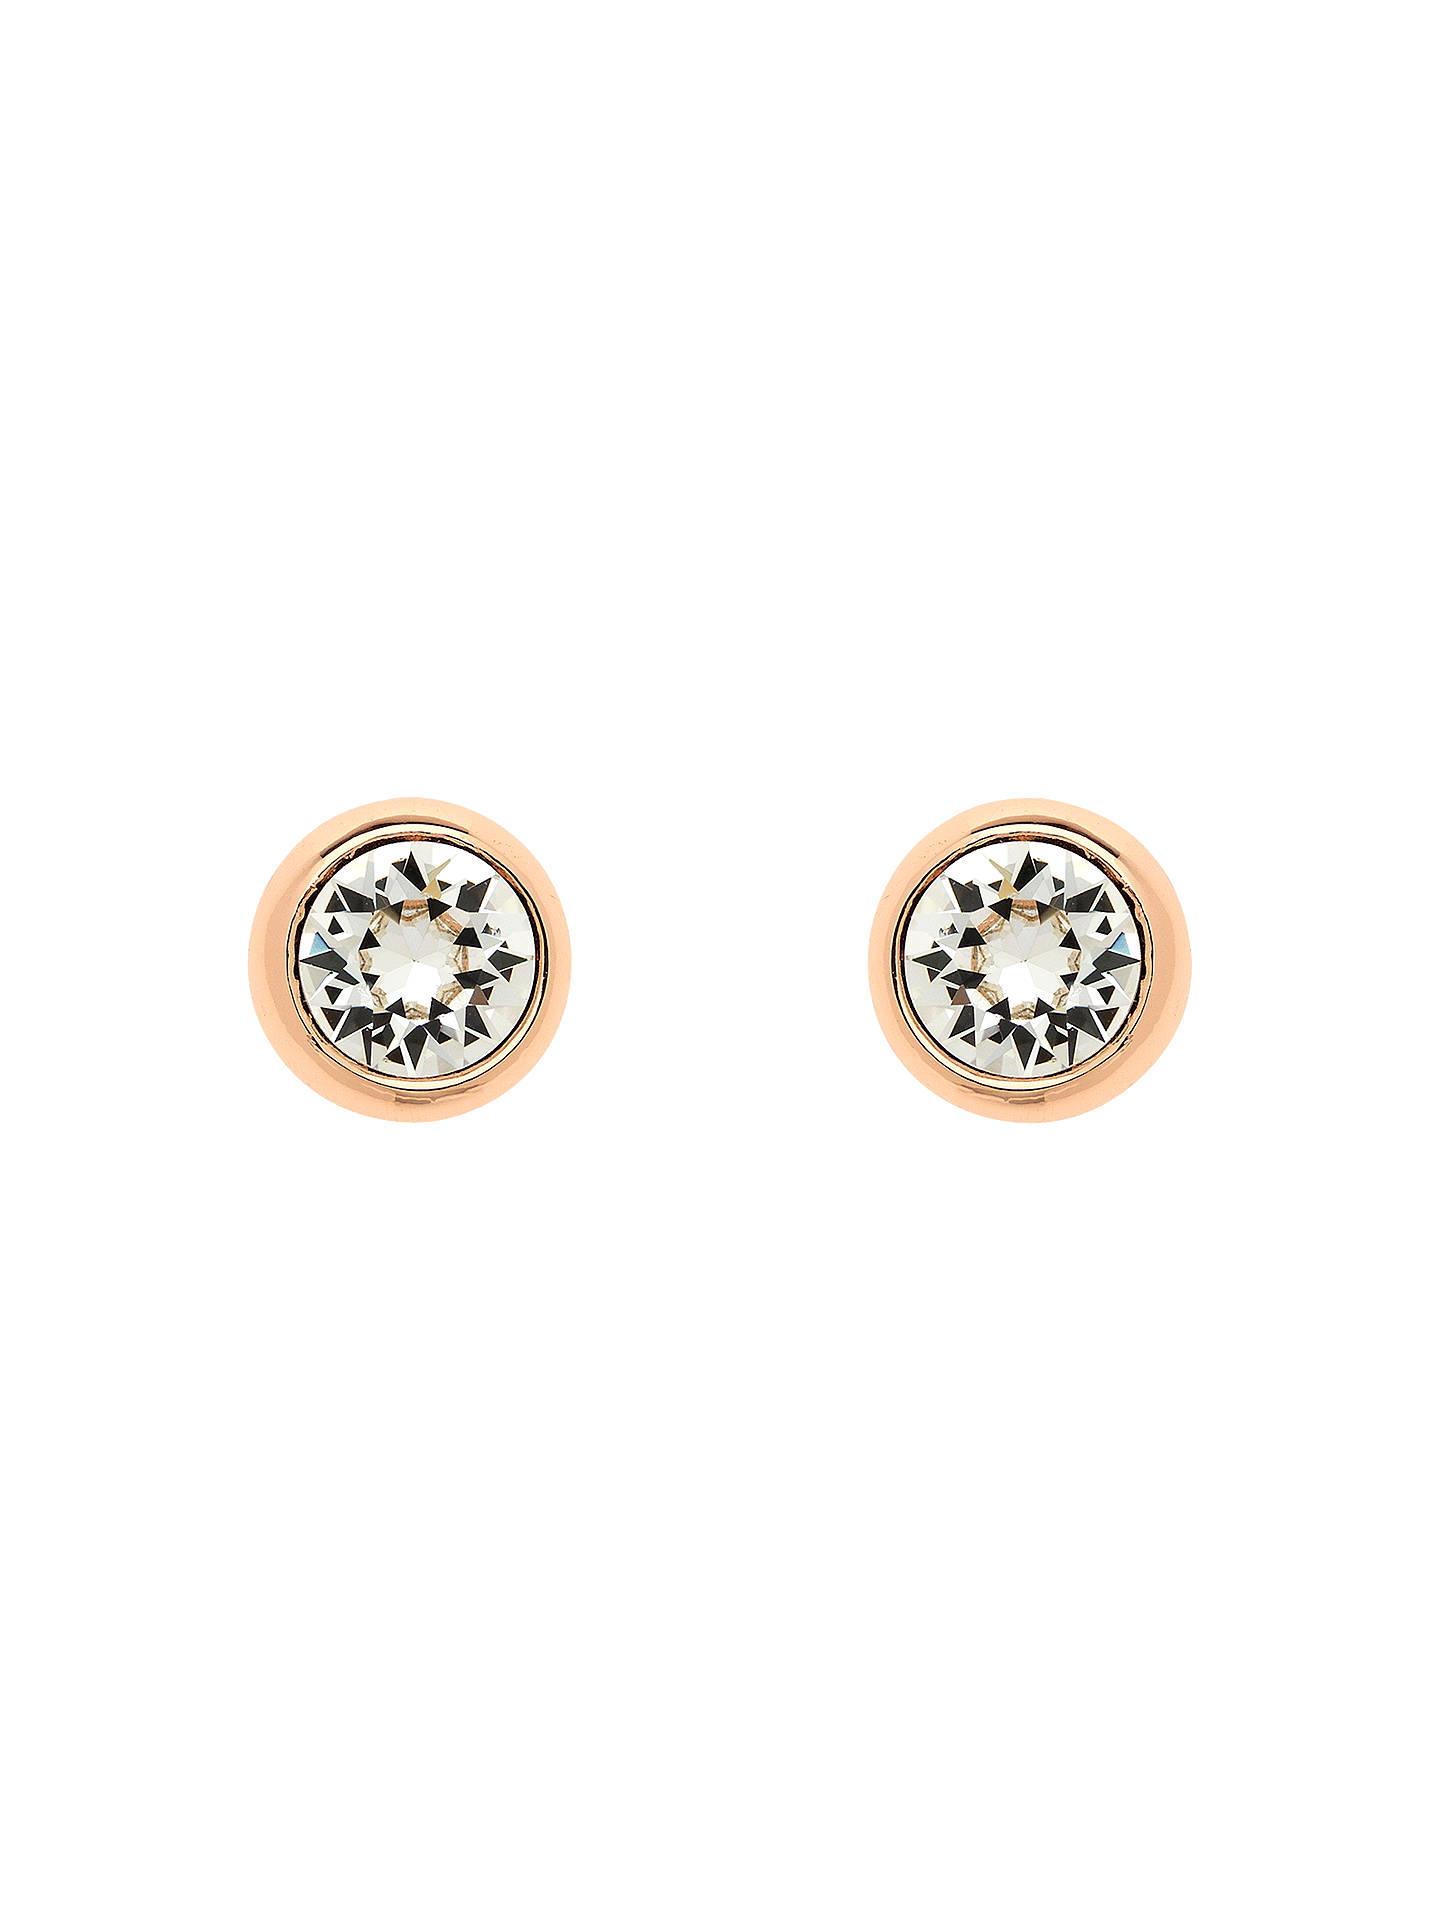 Finesse Swarovski Crystal Stud Earrings Rose Gold Online At Johnlewis